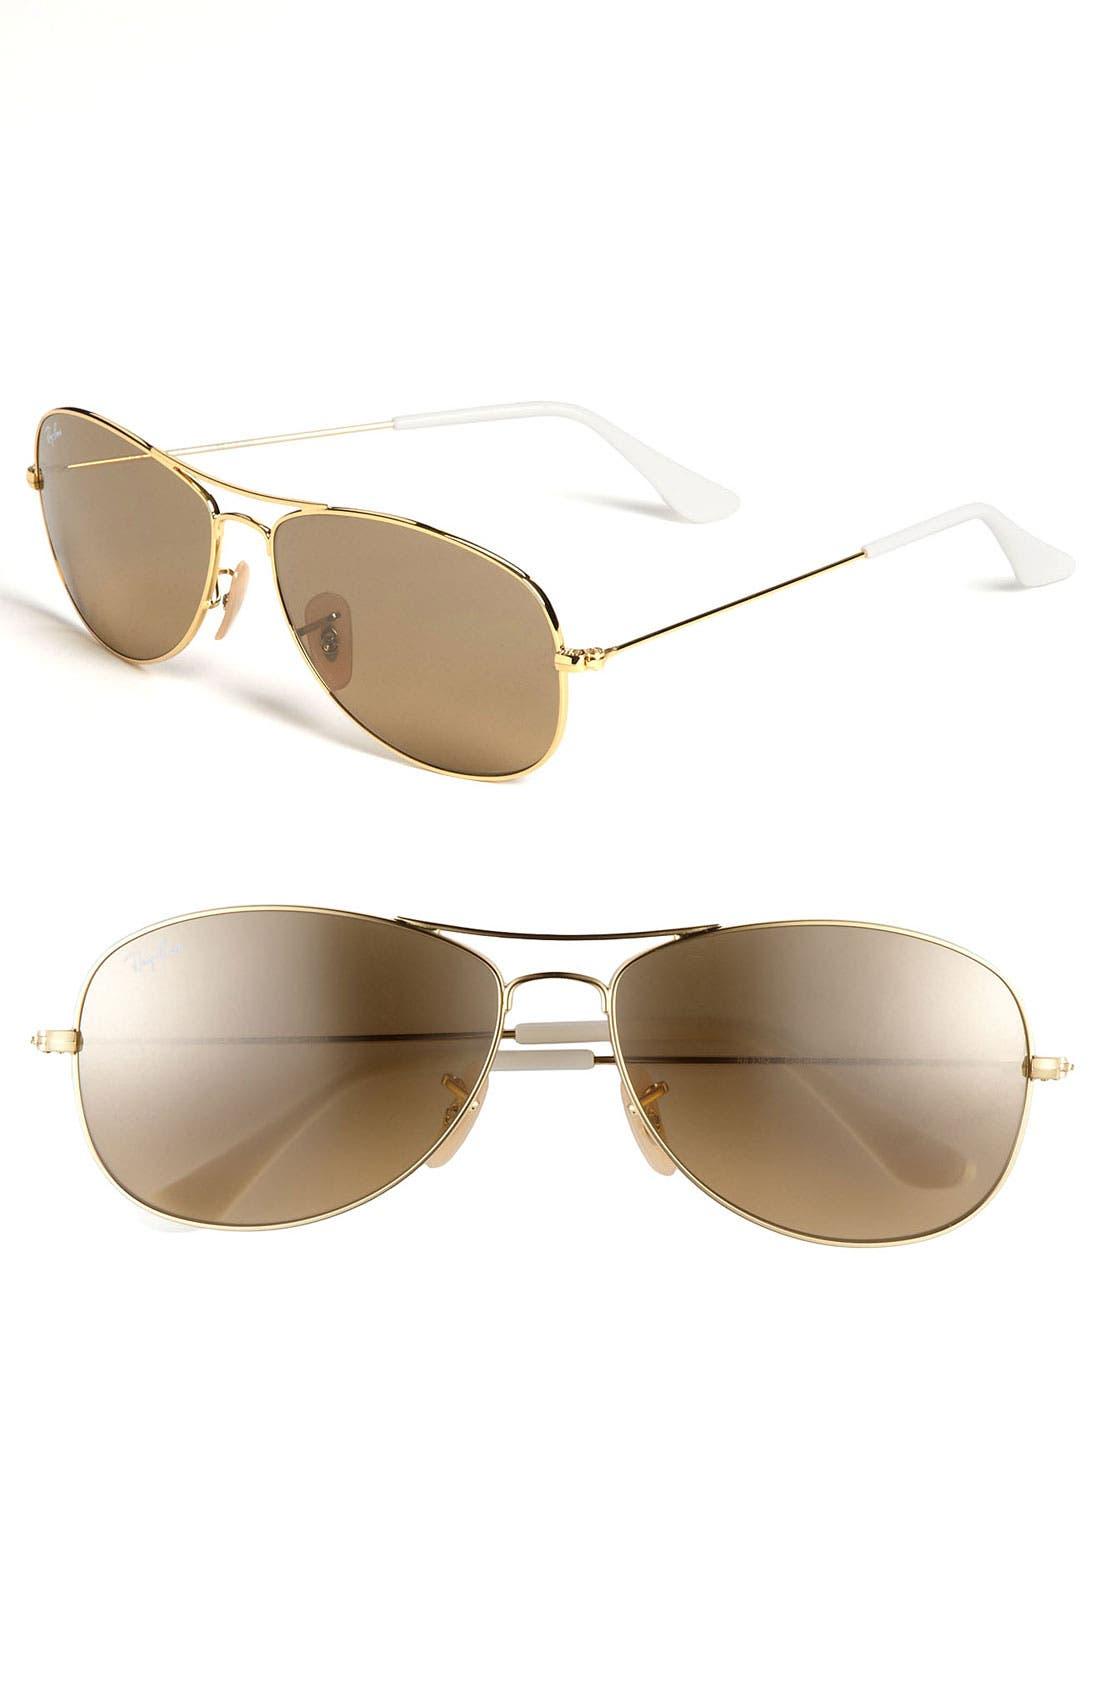 Main Image - Ray-Ban 'New Classic Aviator' 59mm Sunglasses